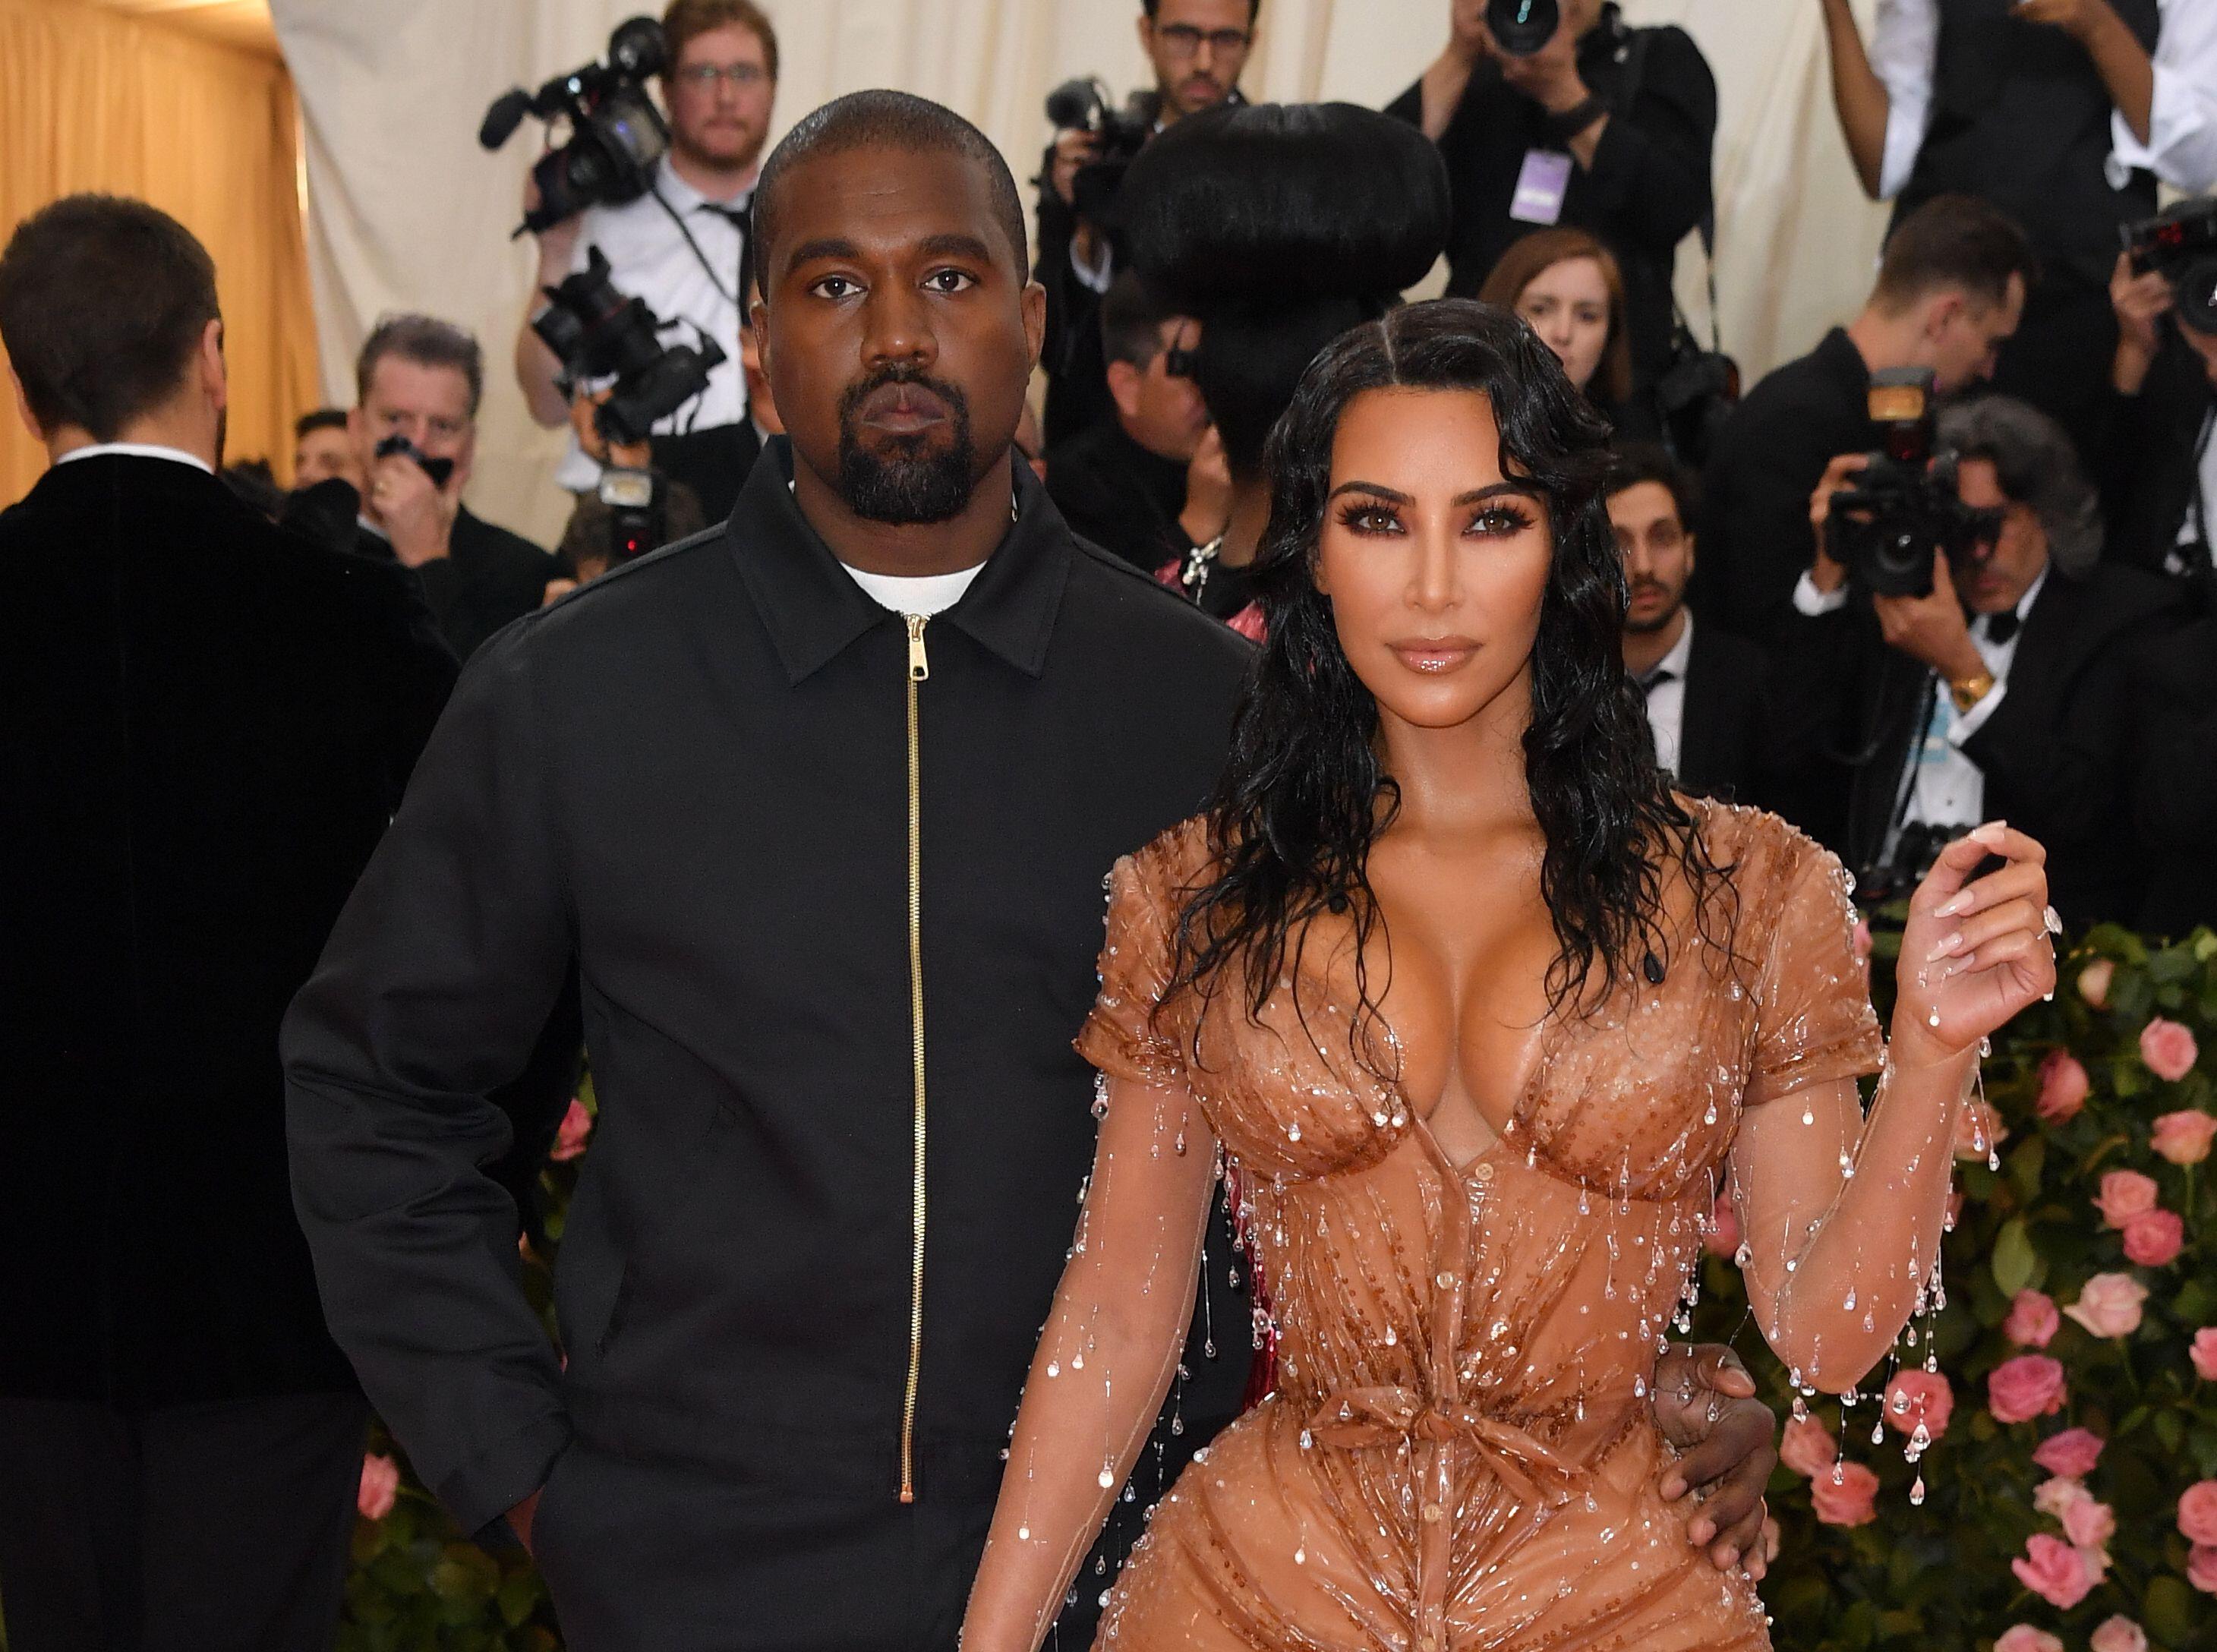 Kim Kardashian West credits Kanye West for boosting her confidence